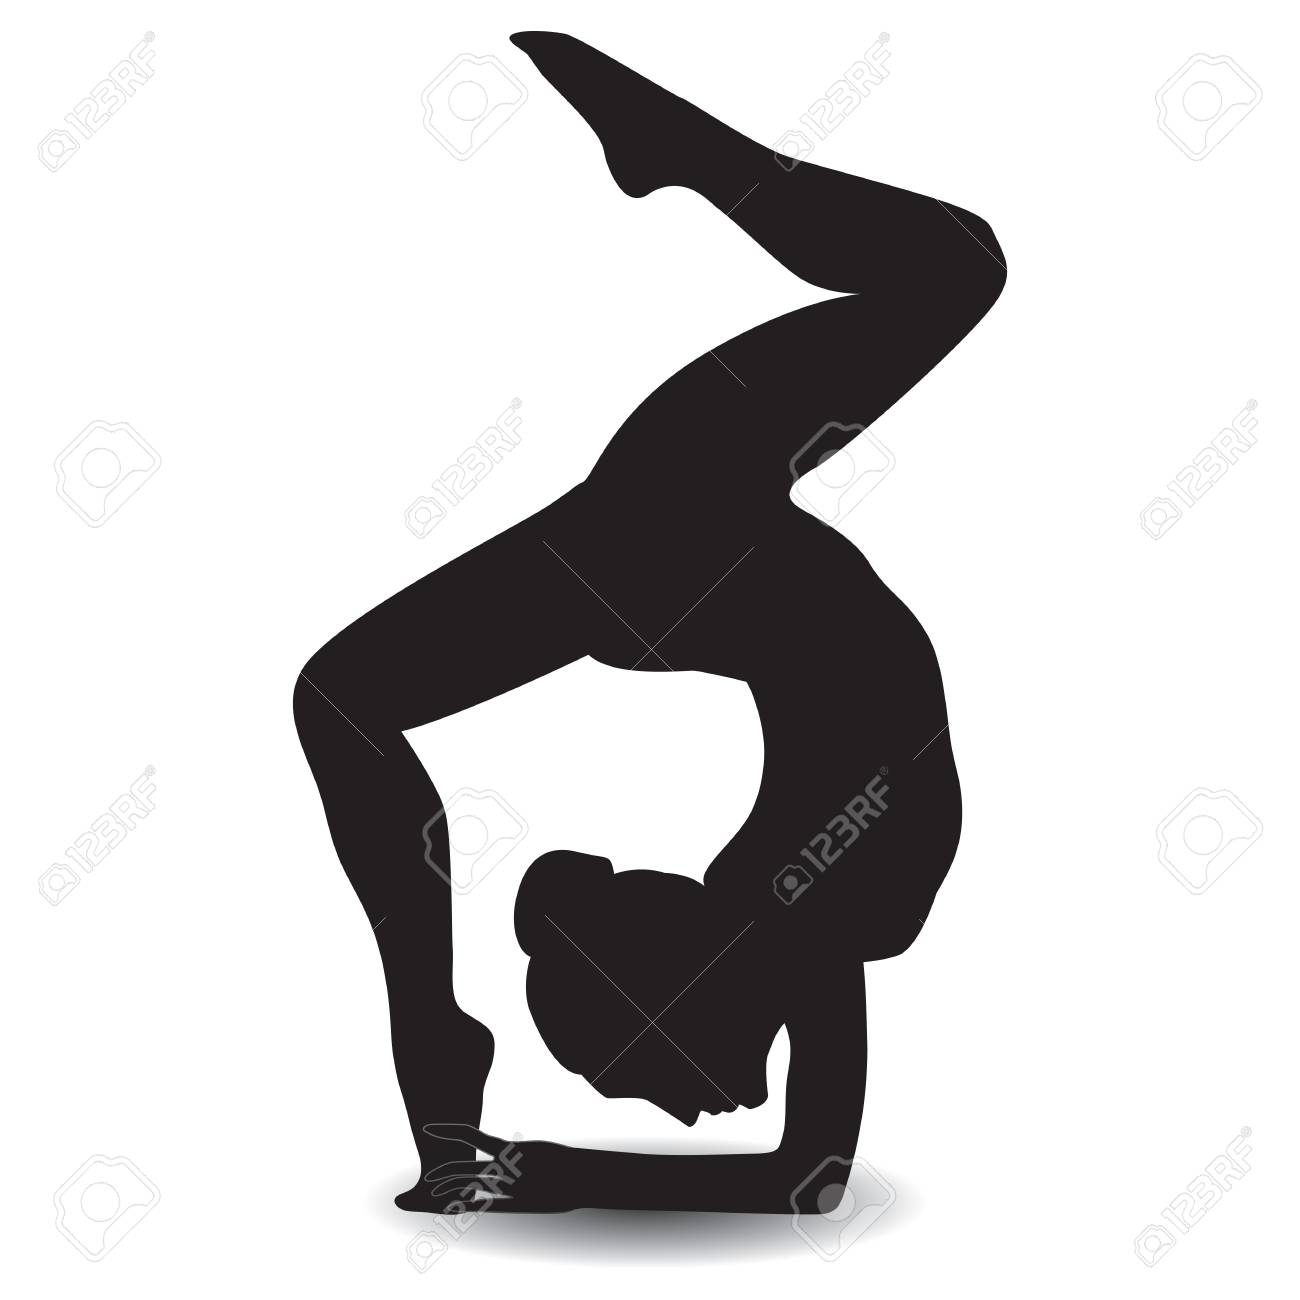 sketch woman gymnast handstand on a white background design element rh 123rf com